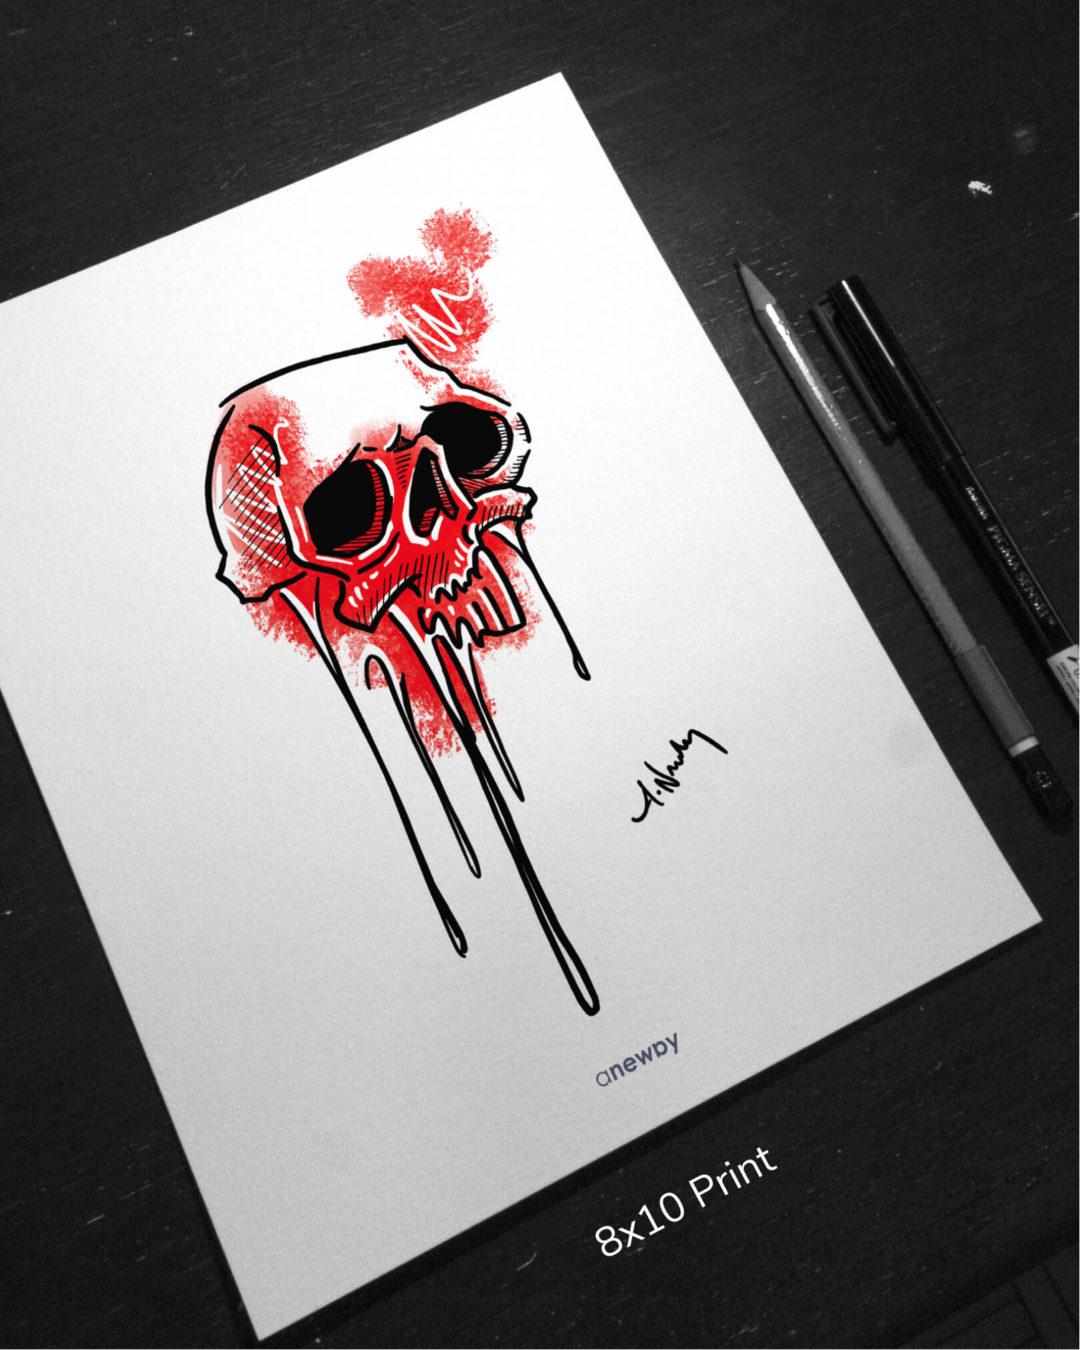 Skull Drips 8x10 Print - anewby